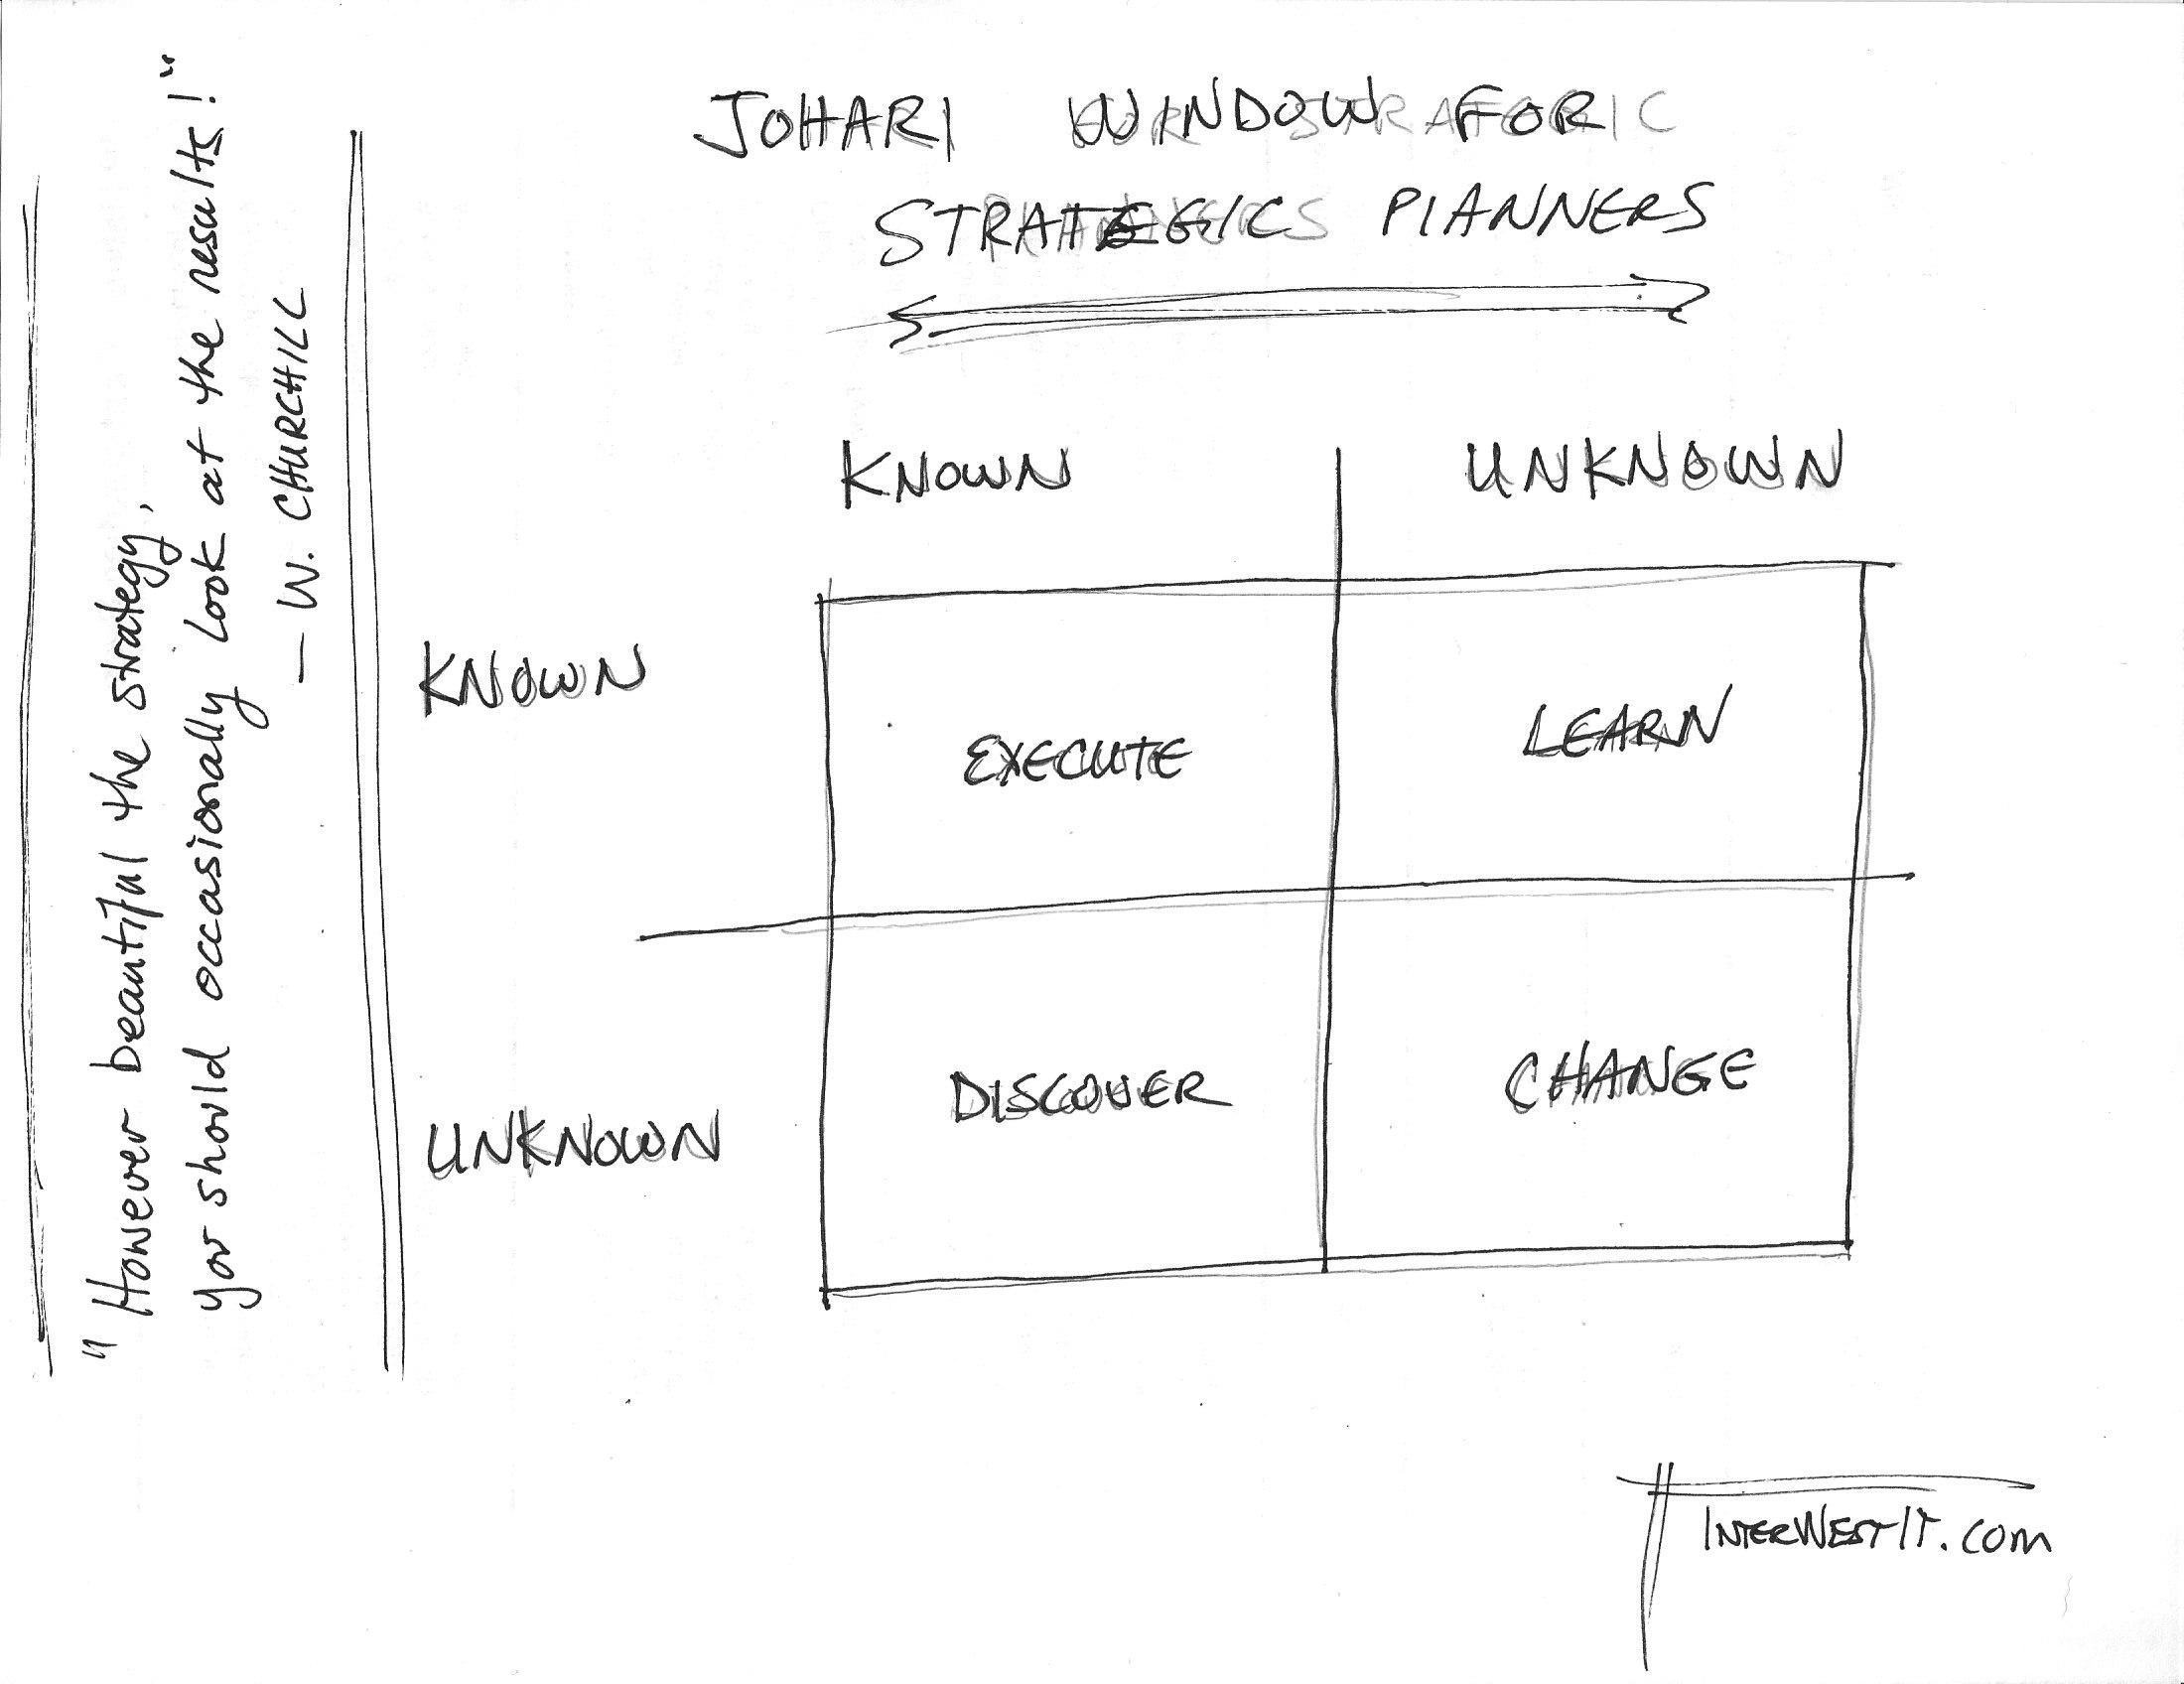 009 Johari Strategic Plan Essay Example Isaac Asimov Awful Essays On Creativity Intelligence Full